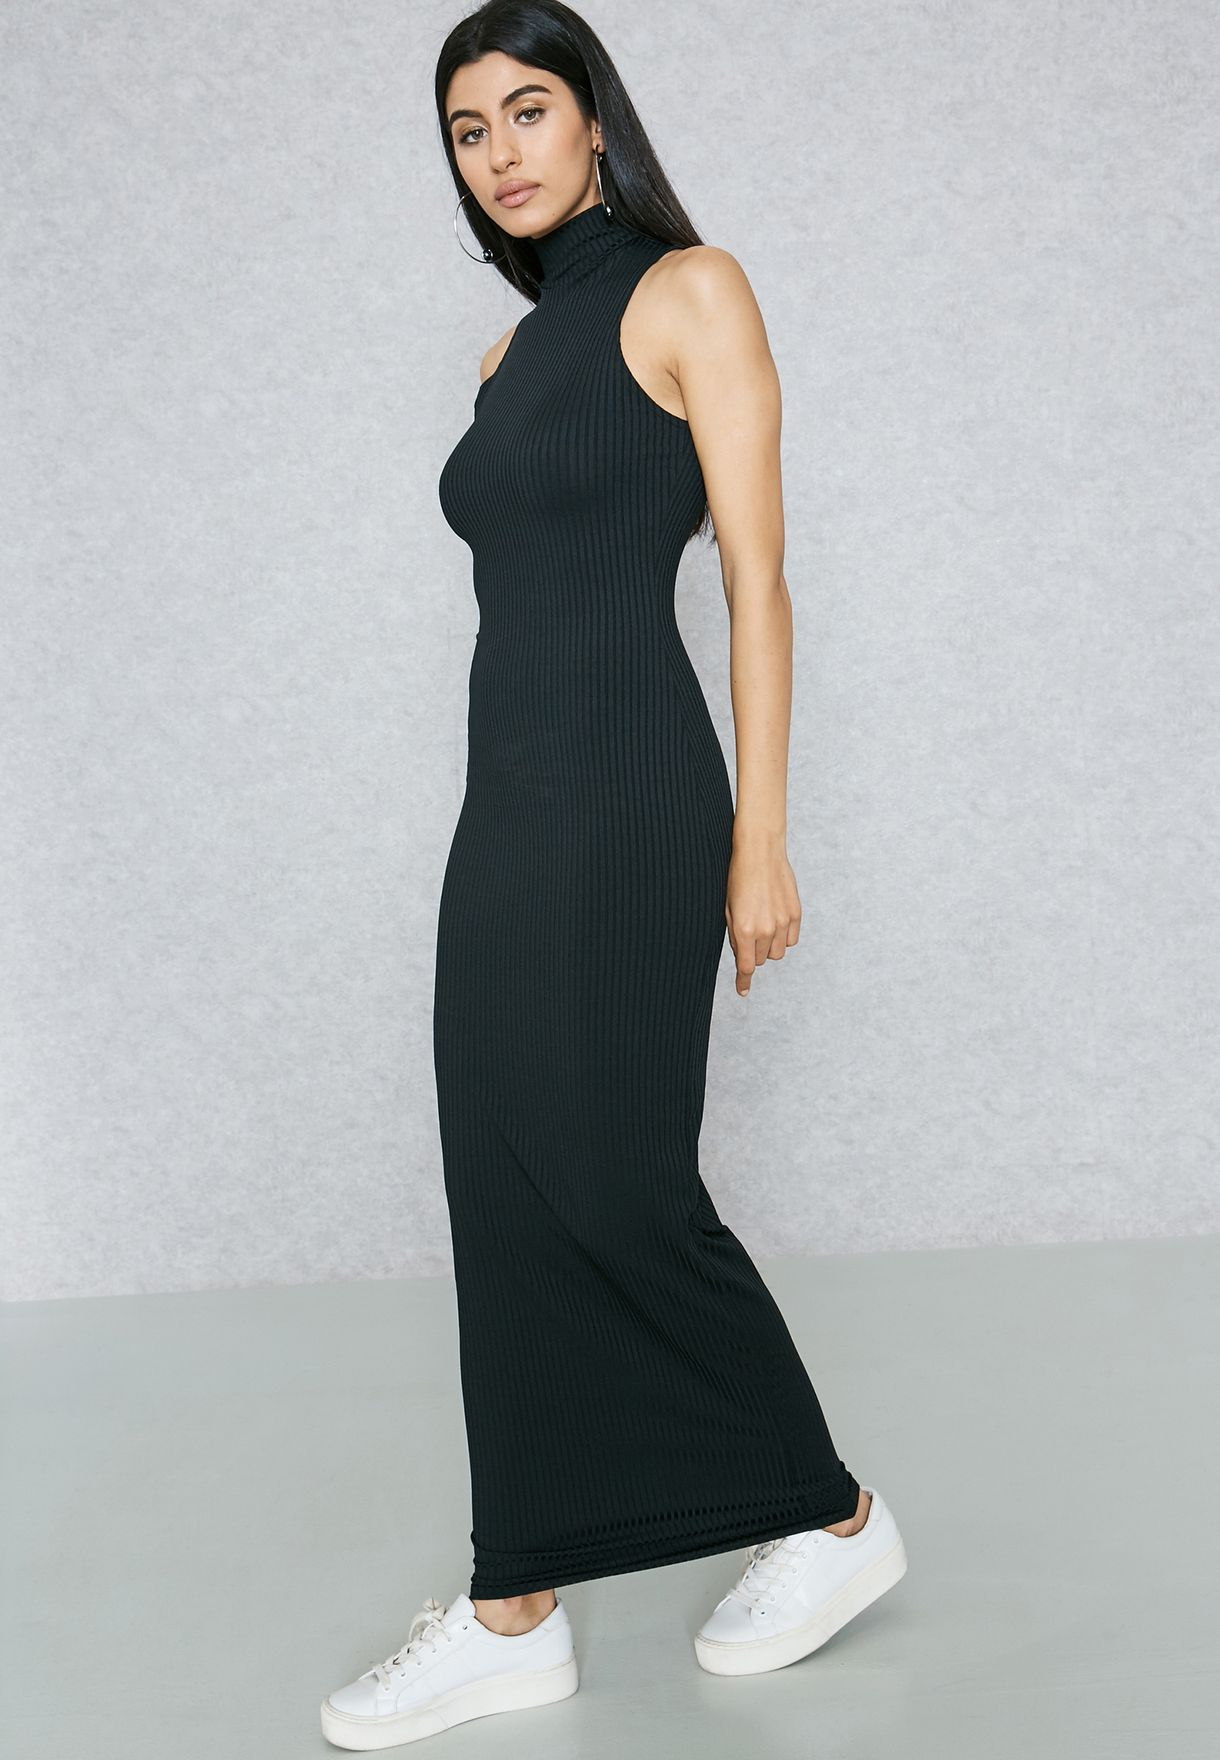 98105943016 Shop Ginger Basics black Ribbed High Neck Maxi Dress M572 for Women ...